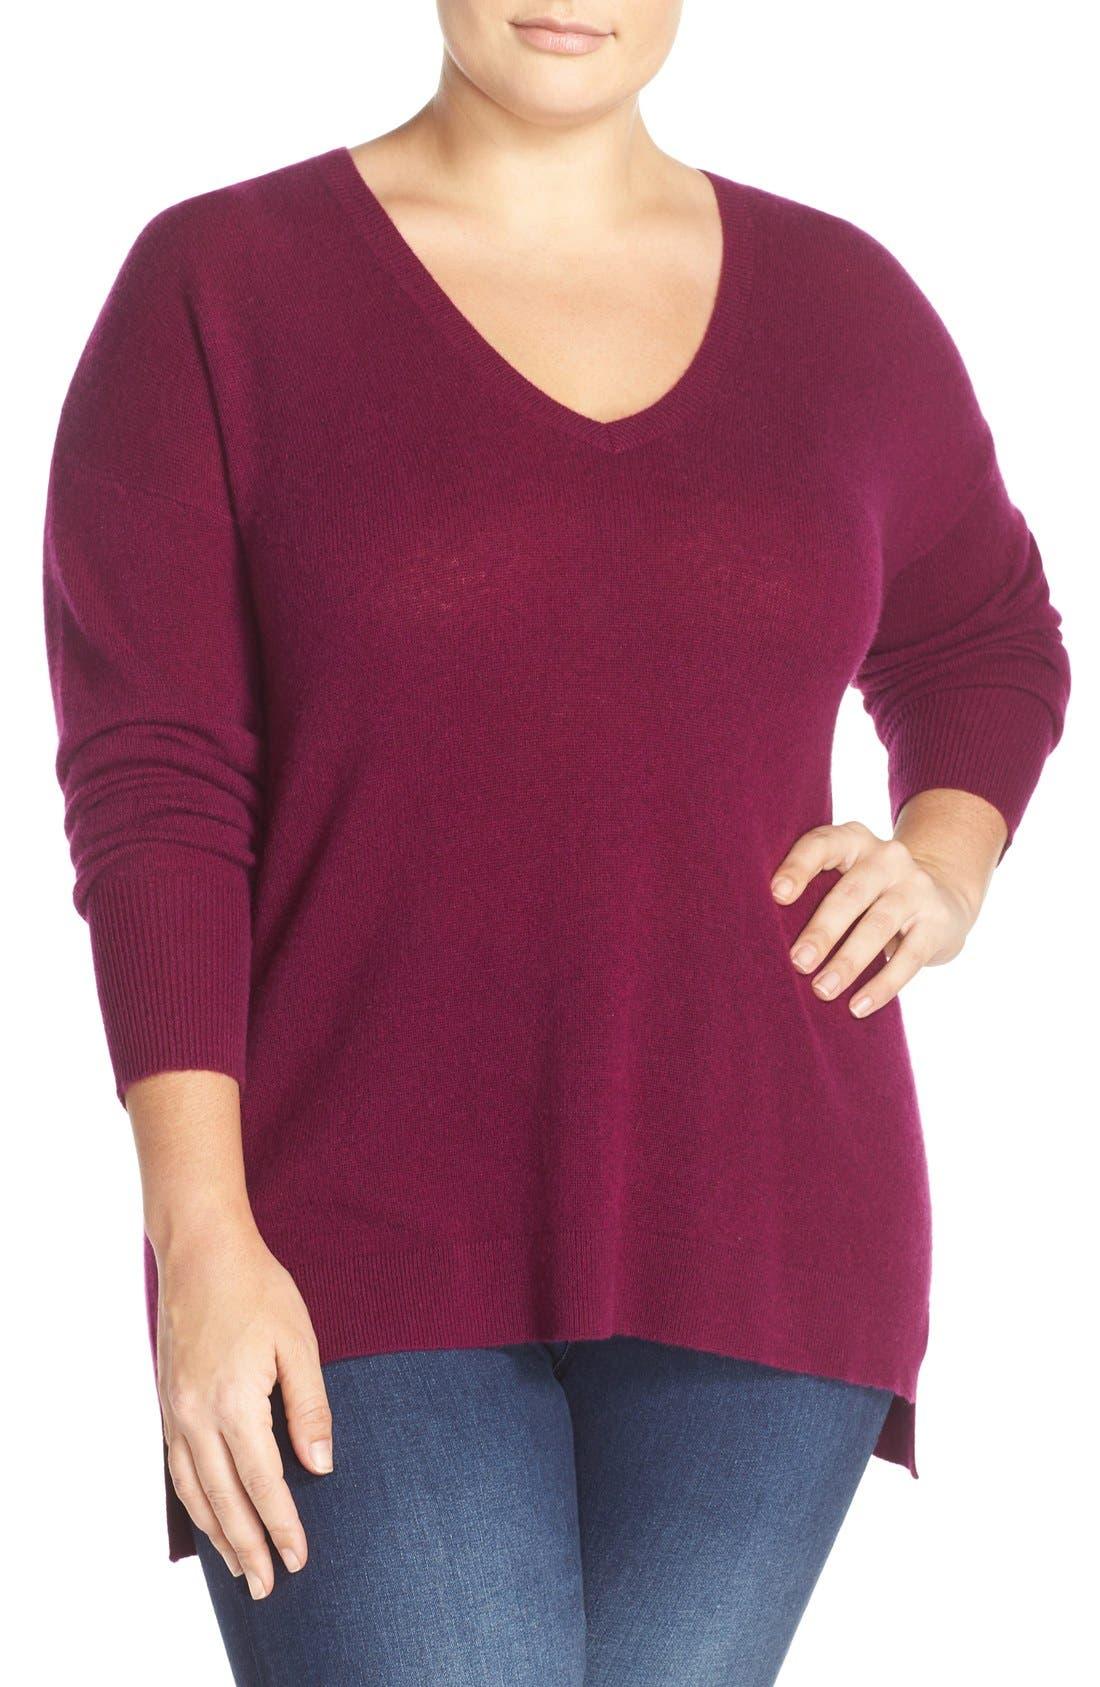 Alternate Image 1 Selected - Halogen® V-Neck Cashmere Sweater (Plus Size)